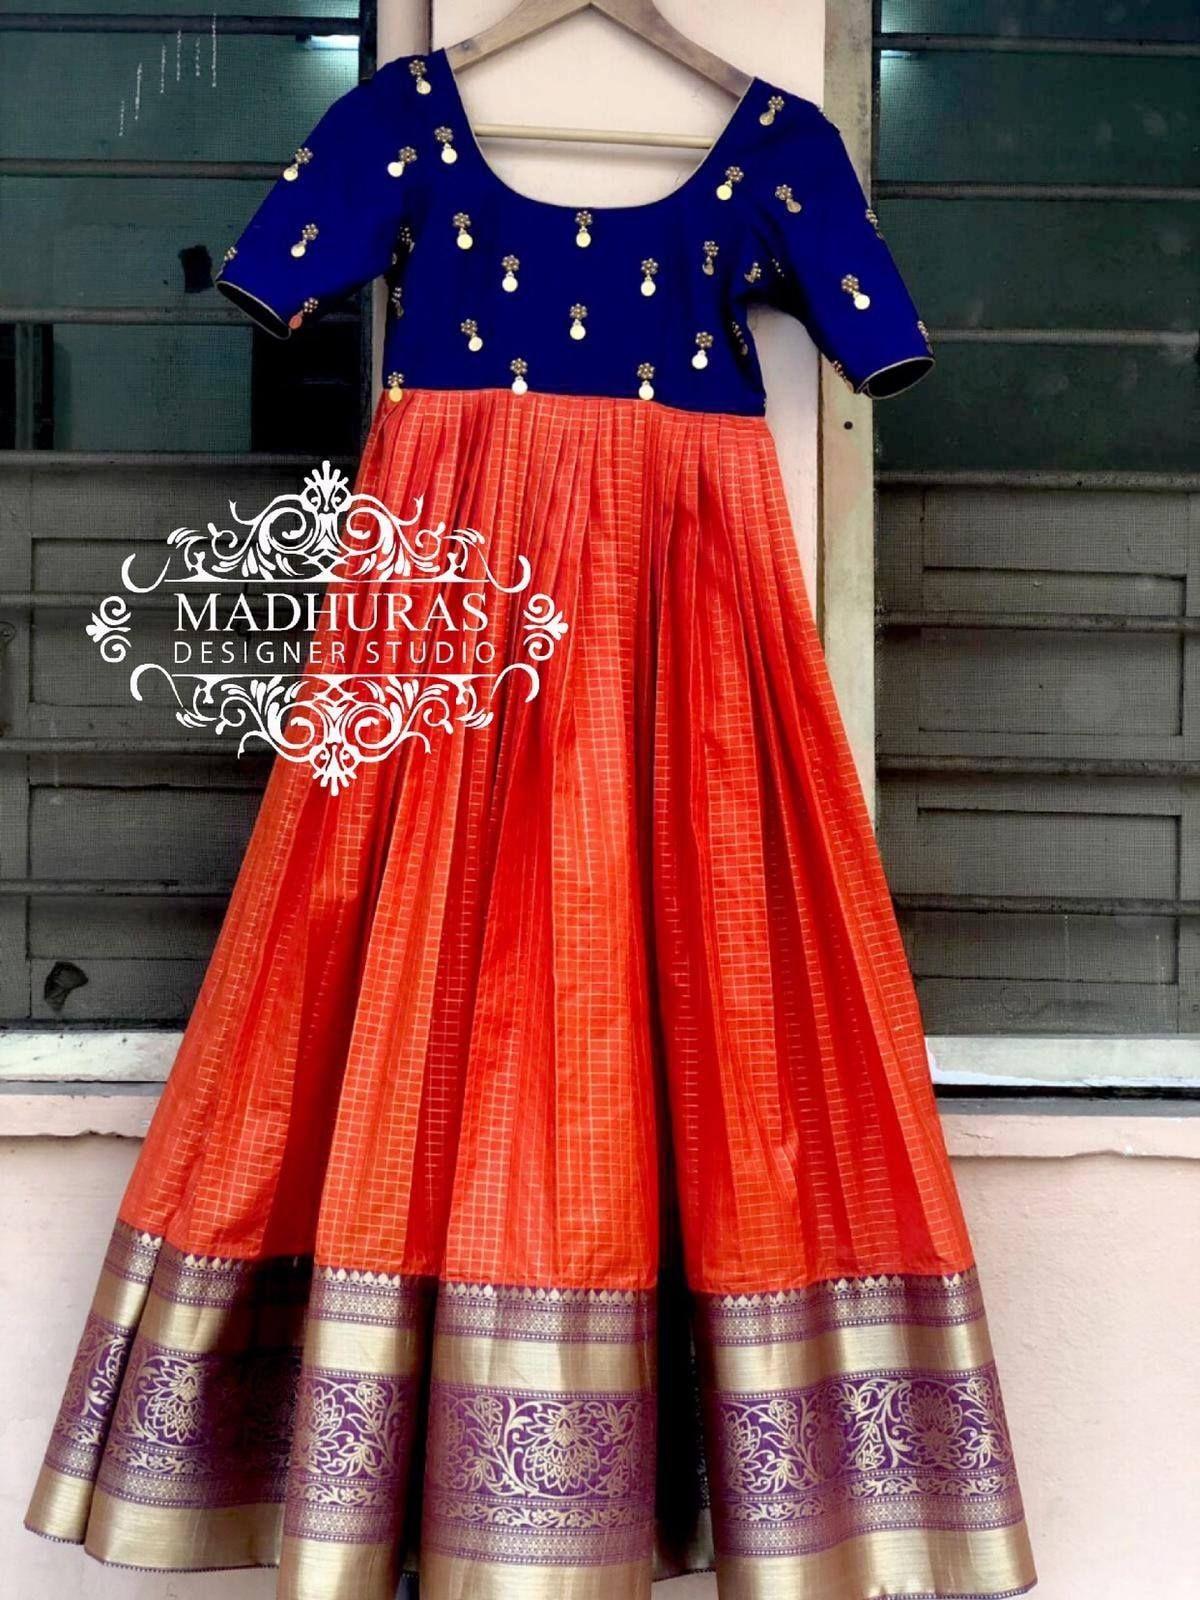 b32733f6de08 Beautiful orange and blue color combination ankle length dress with hand  embroidery kasu work on yoke